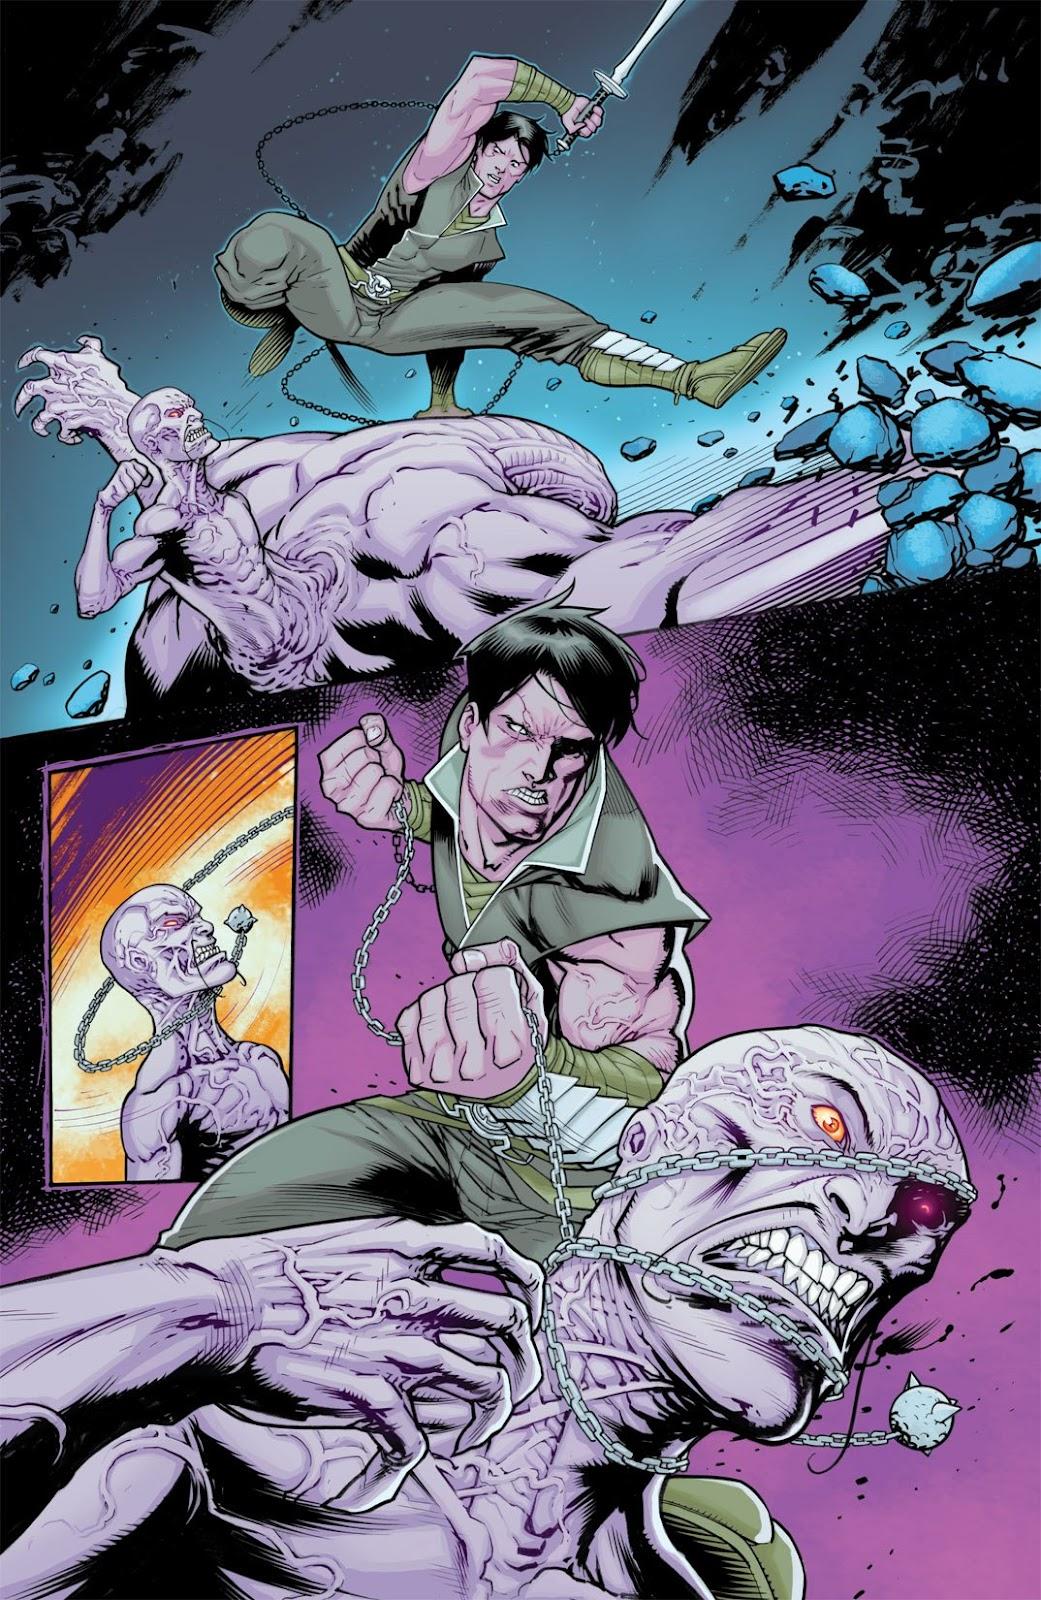 Read online Reaper comic -  Issue #2 - 39